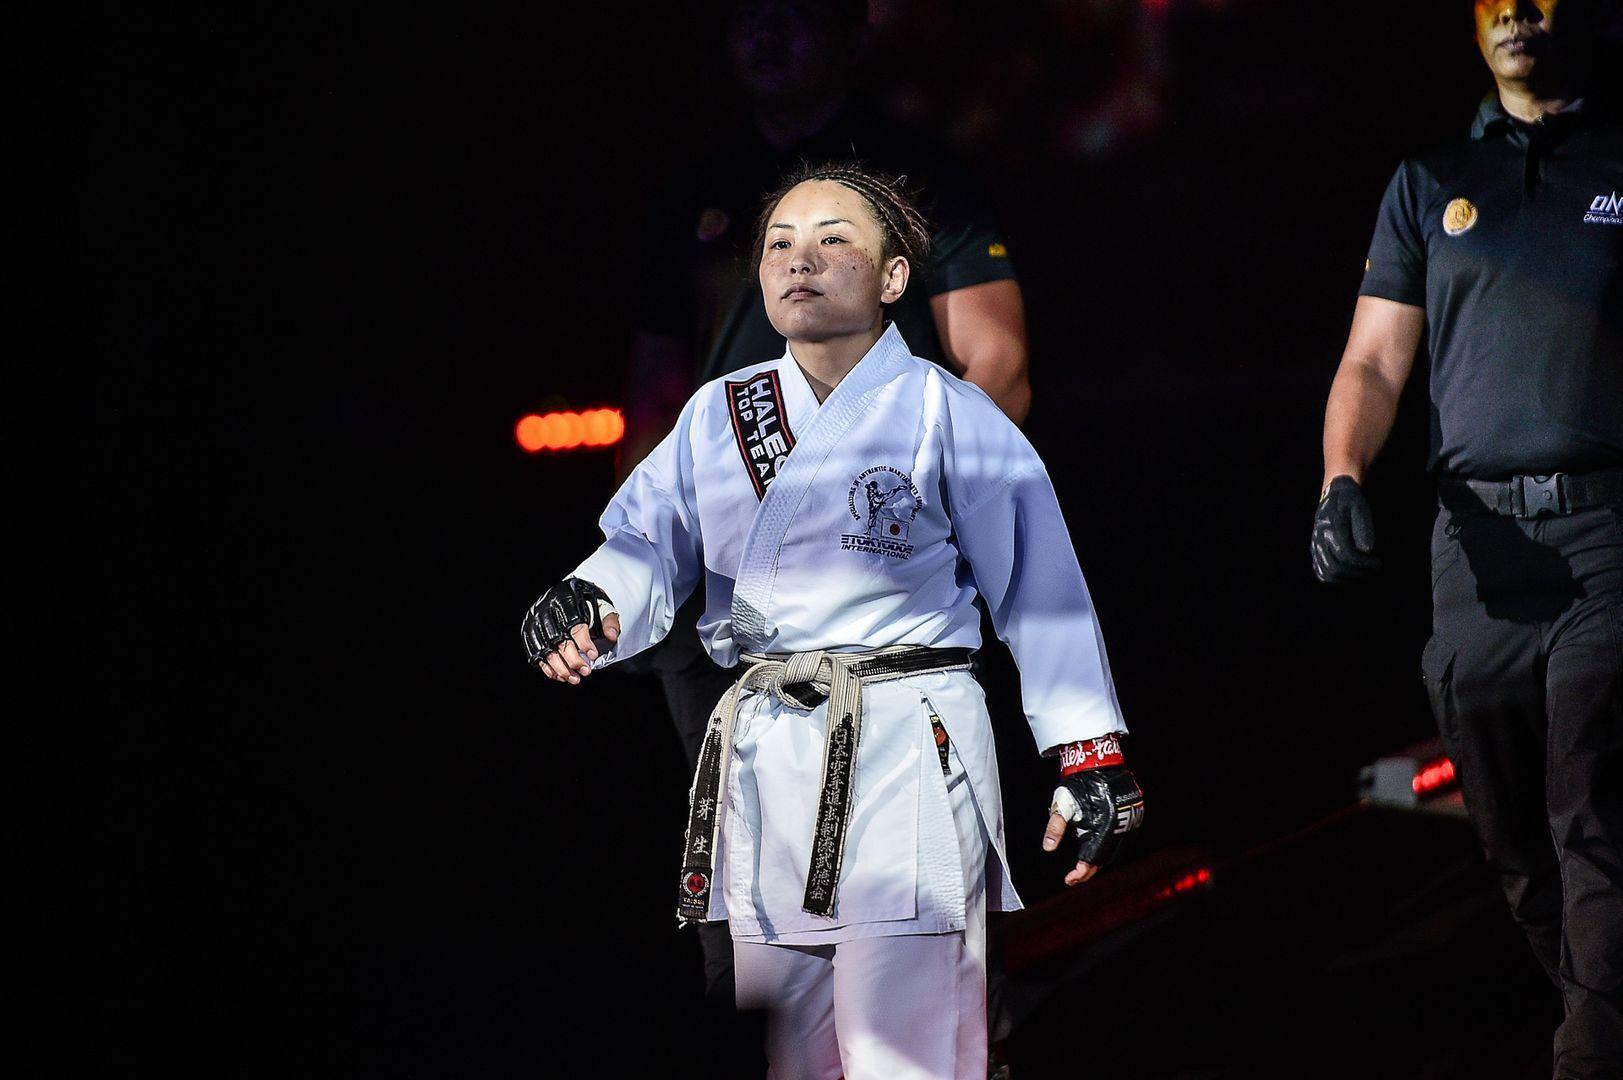 Mei Yamaguchi walks out in her karate gi